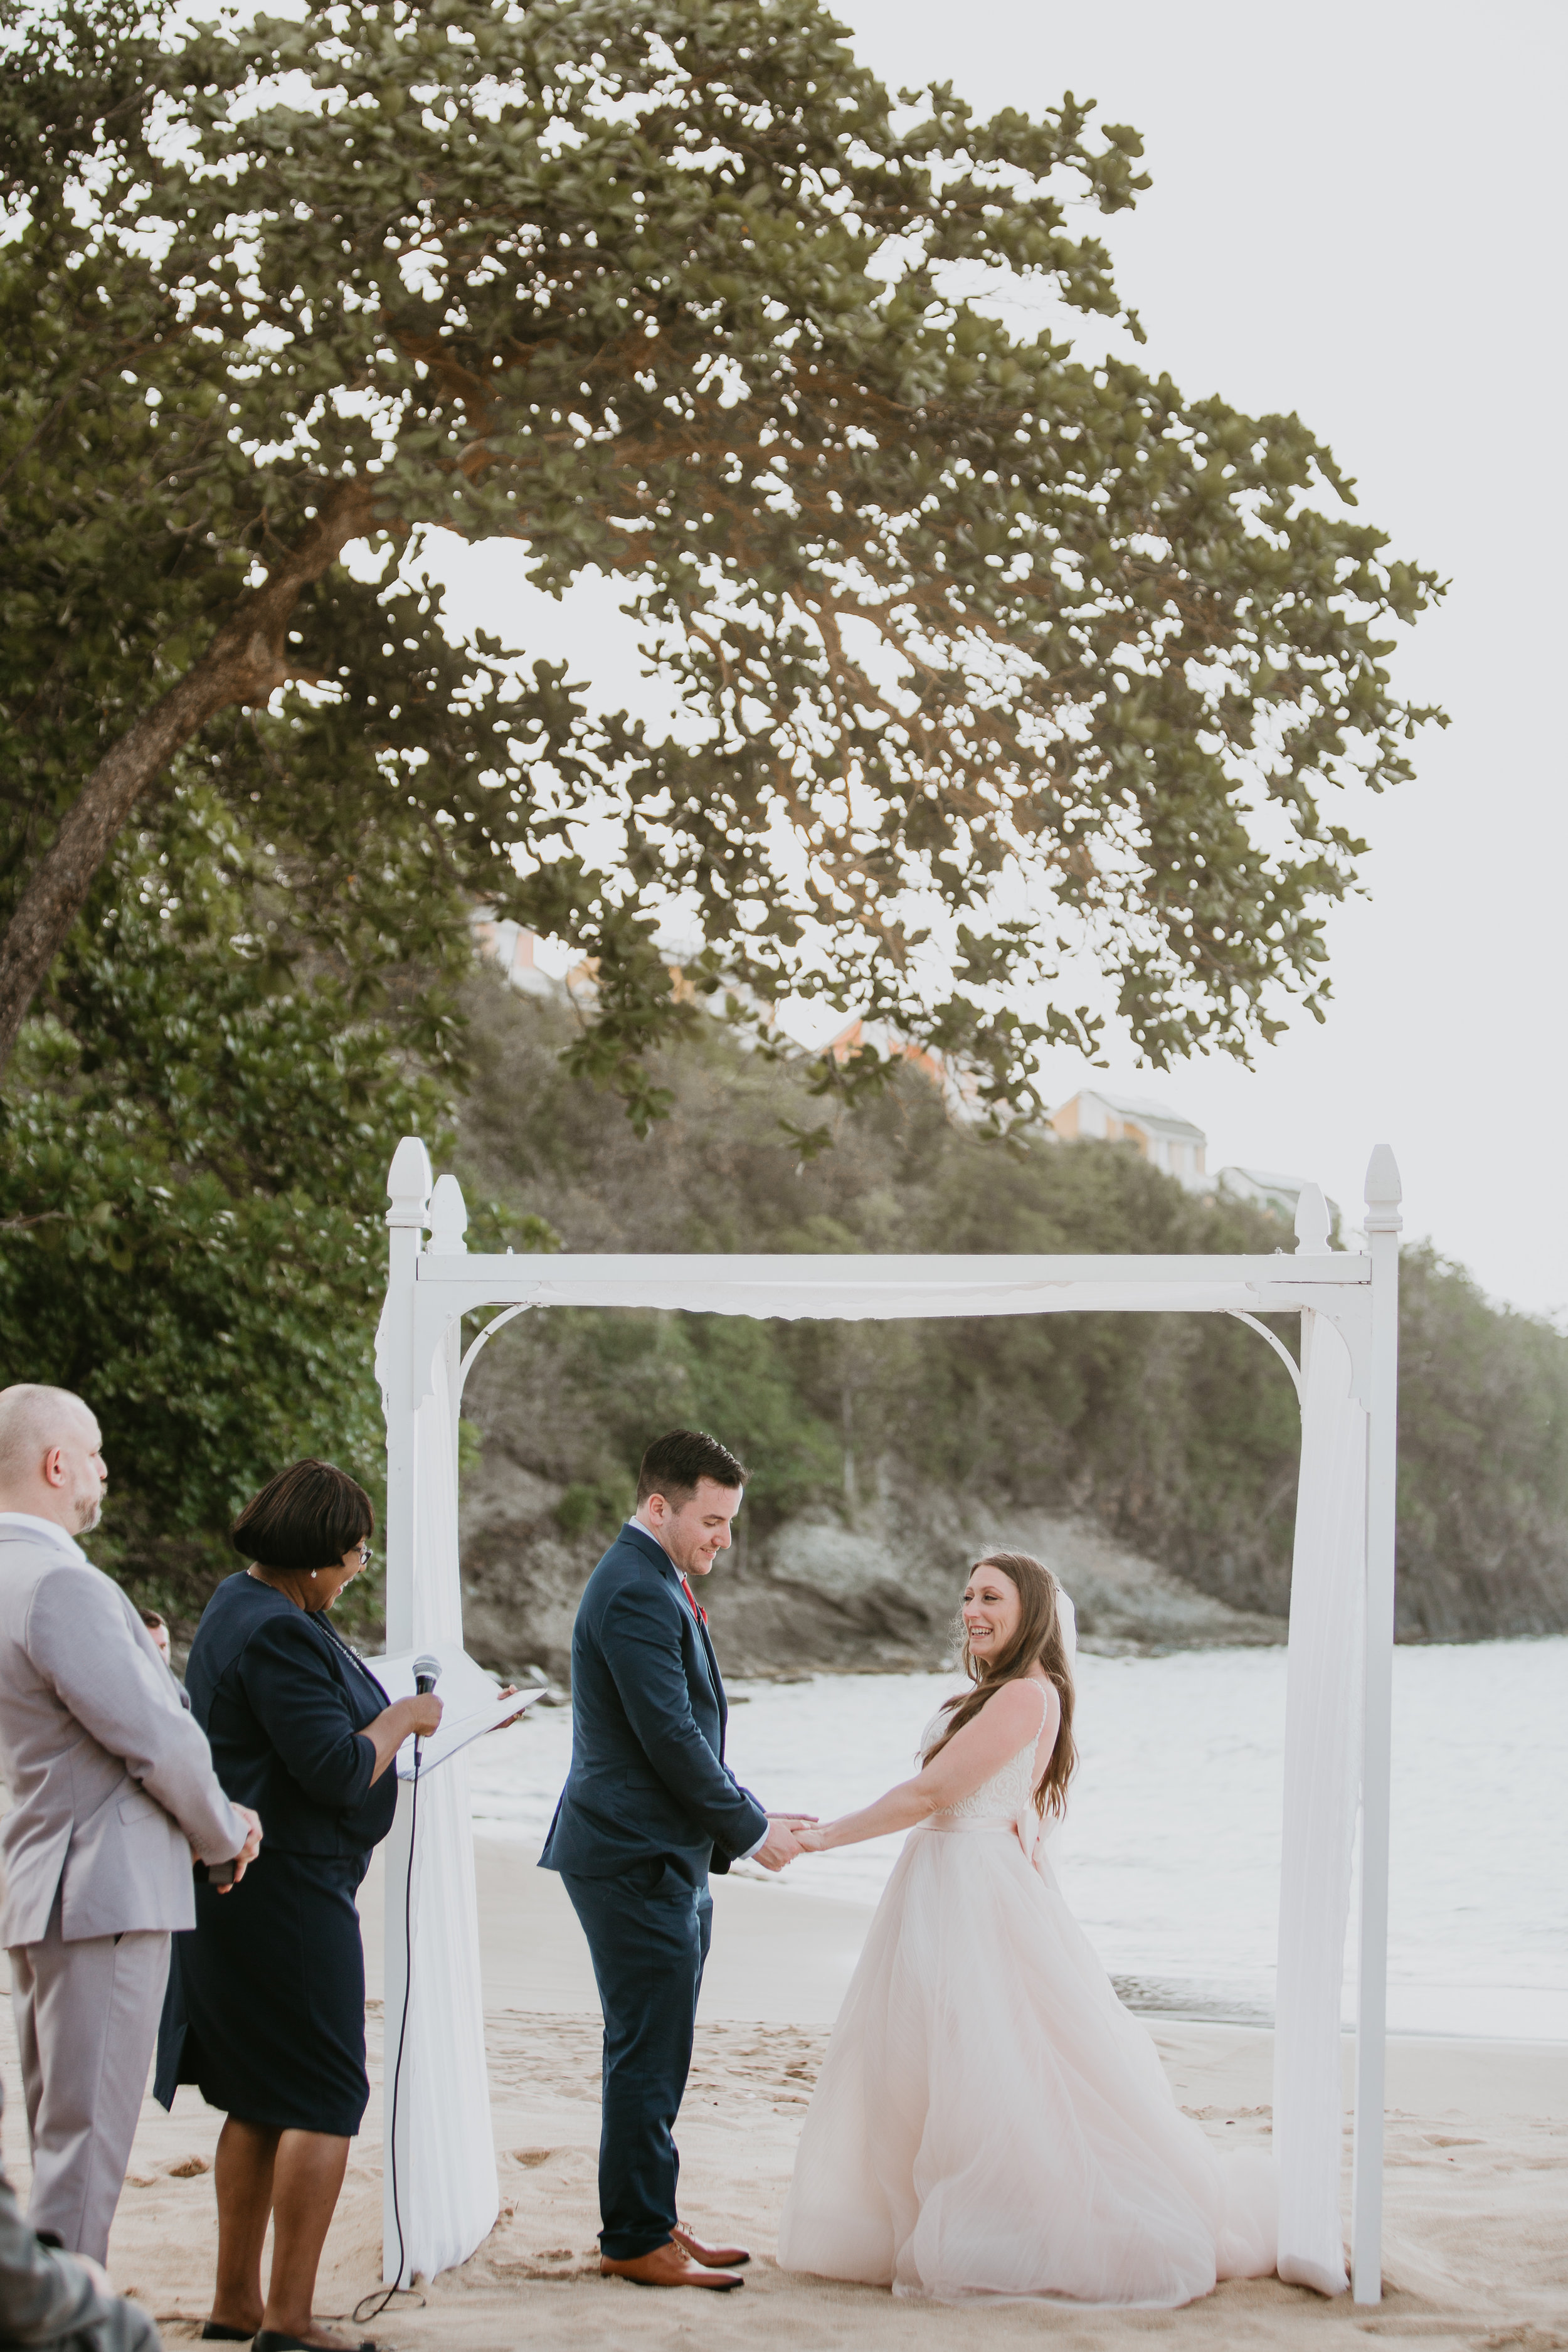 nicole-daacke-photography-destination-wedding-in-st-lucia-sandals-la-toc-intimate-island-wedding-carribean-elopement-photographer-chill-island-wedding-65.jpg